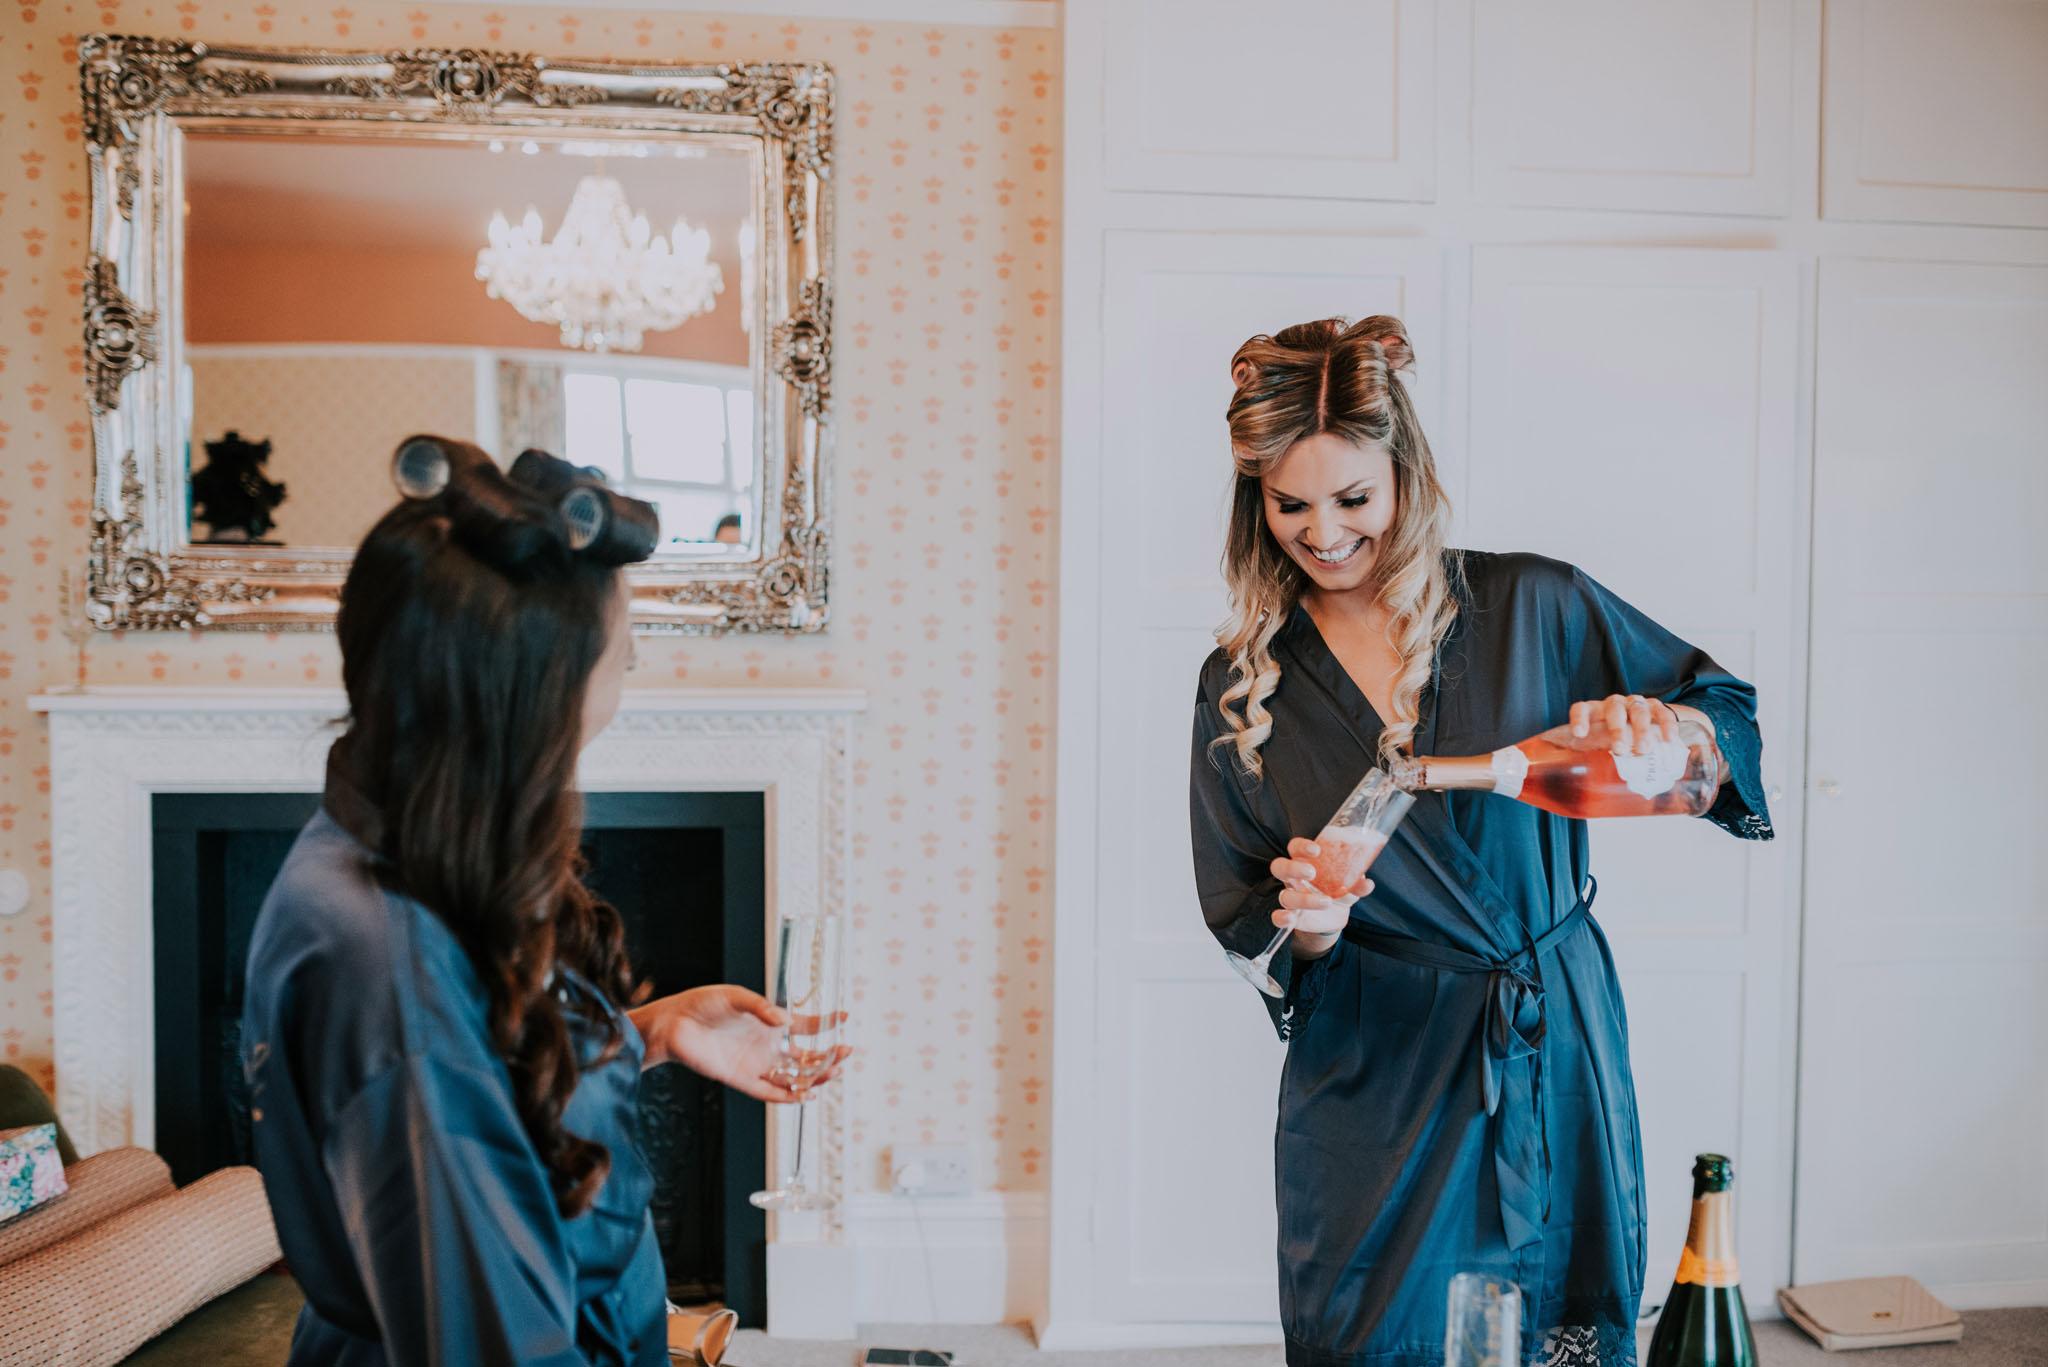 wedding-photographer-glewstone-court-hereford-scott-stockwell-photography060.jpg